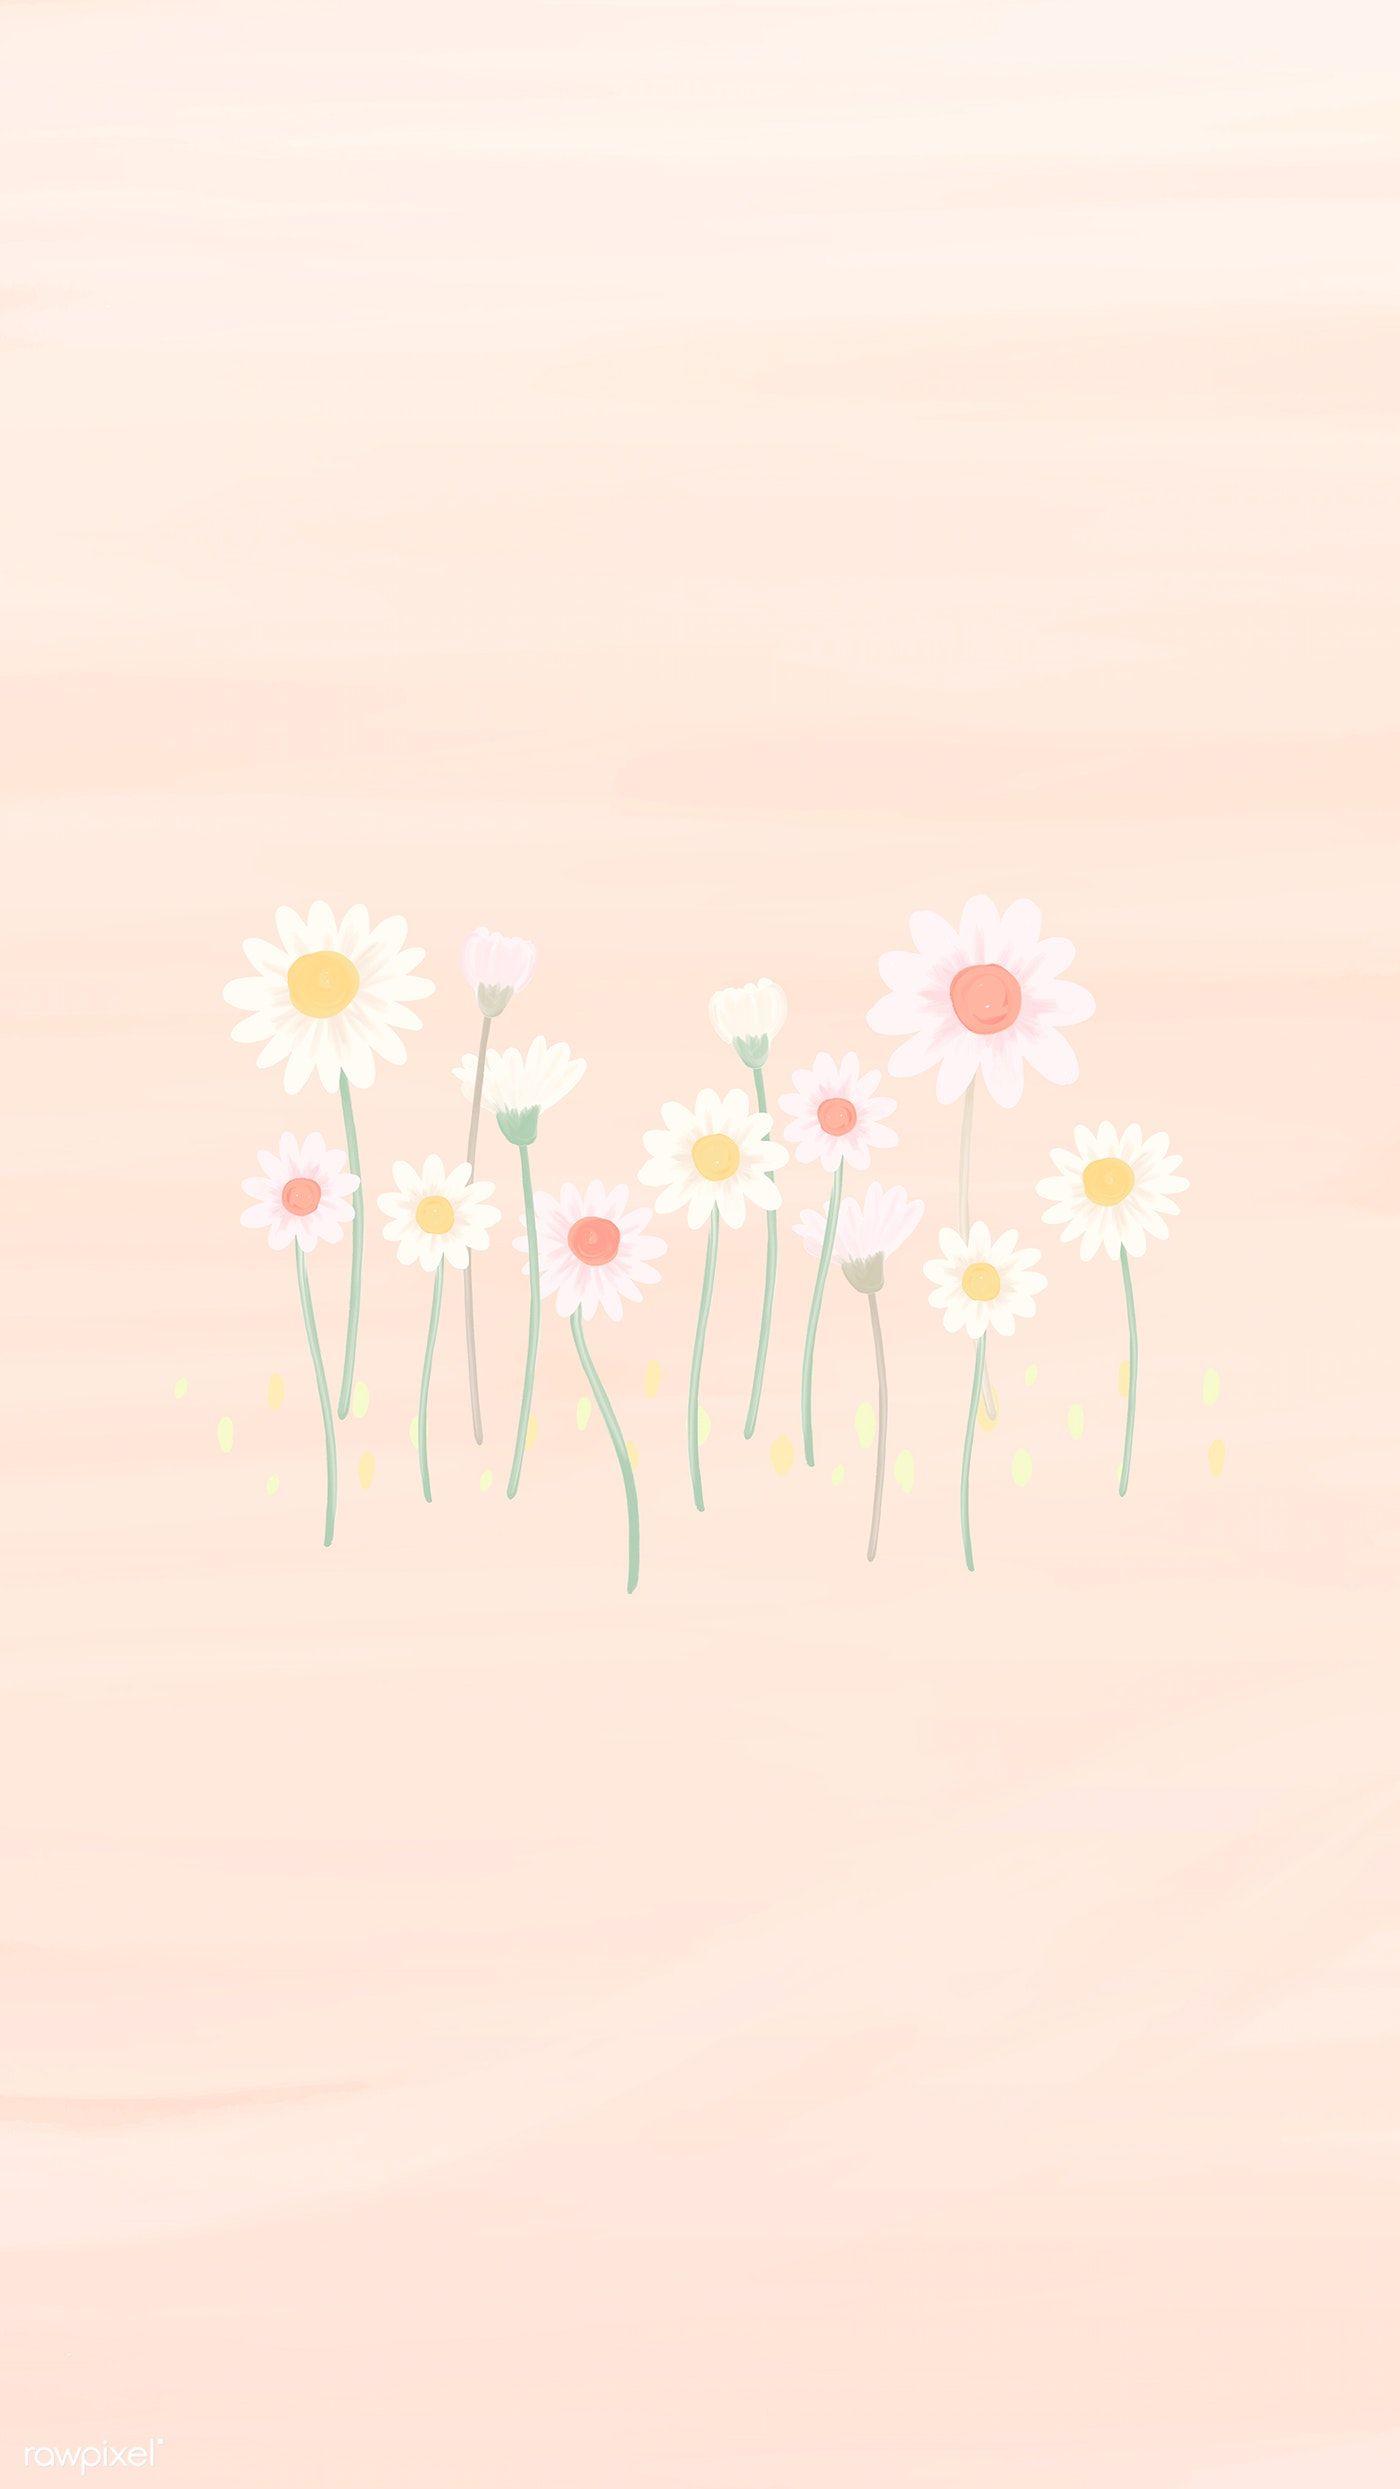 Download Premium Vector Of Hand Drawn Daisy Mobile Phone Wallpaper Vector Daisy Wallpaper Flower Phone Wallpaper Flower Wallpaper